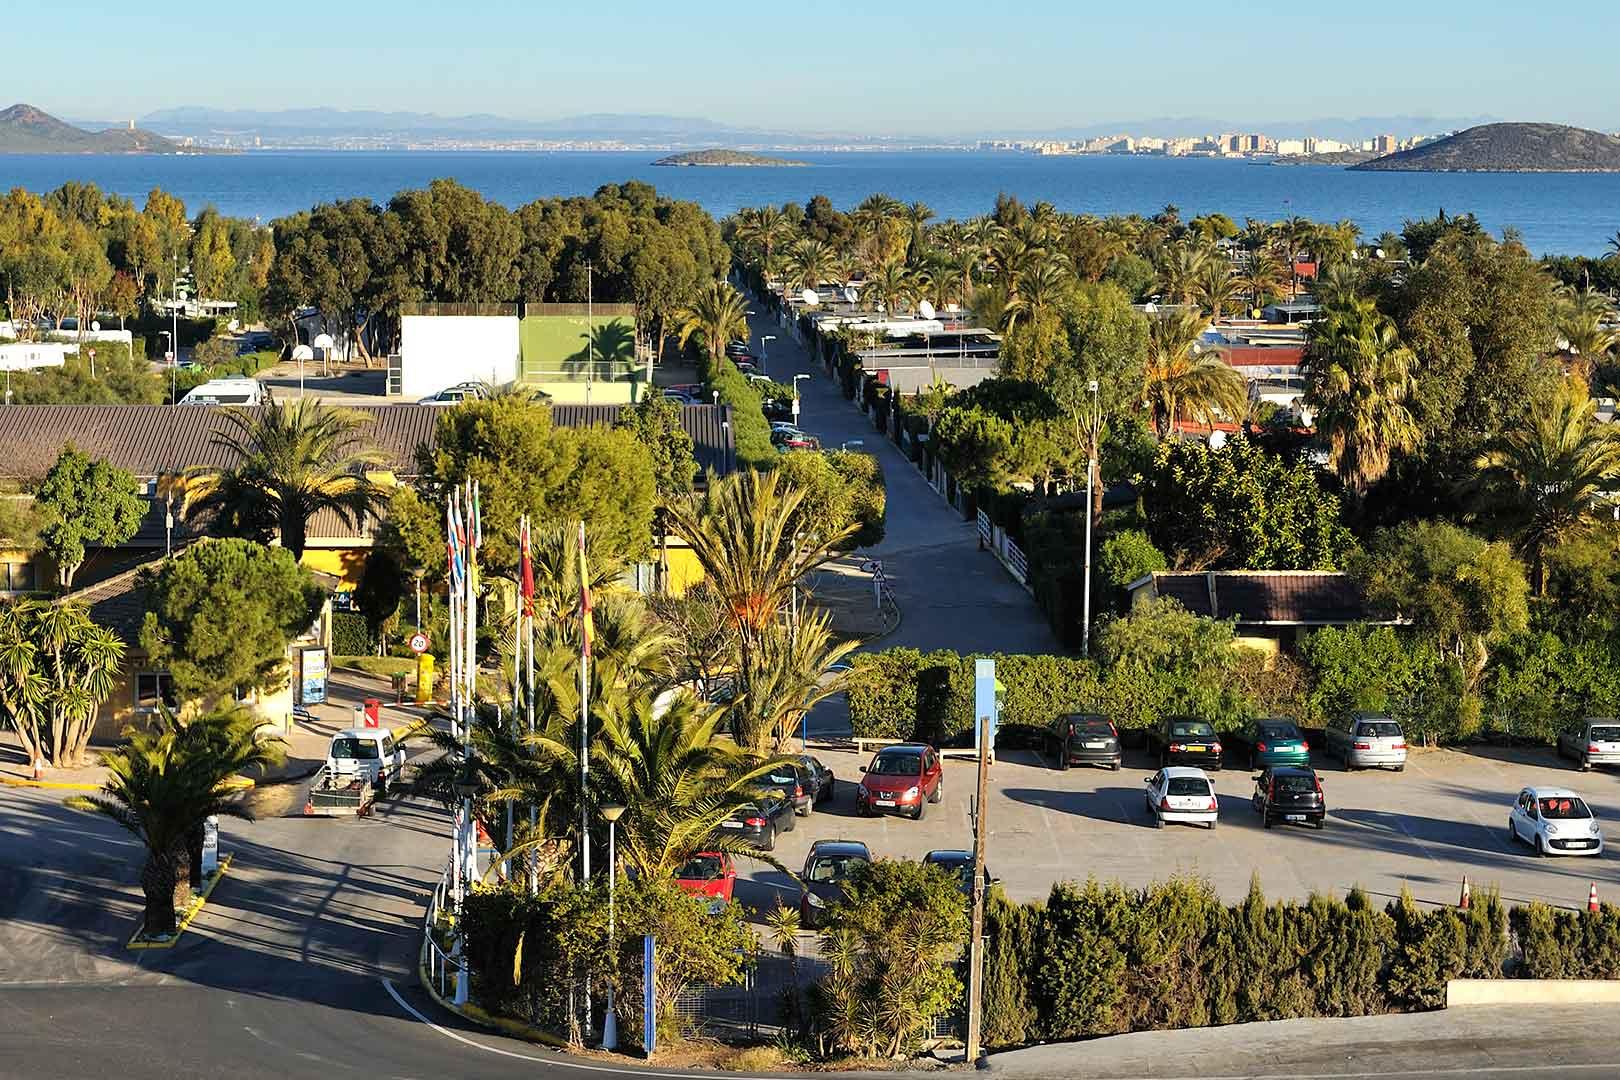 Stresa Mar Menor bungalow economici